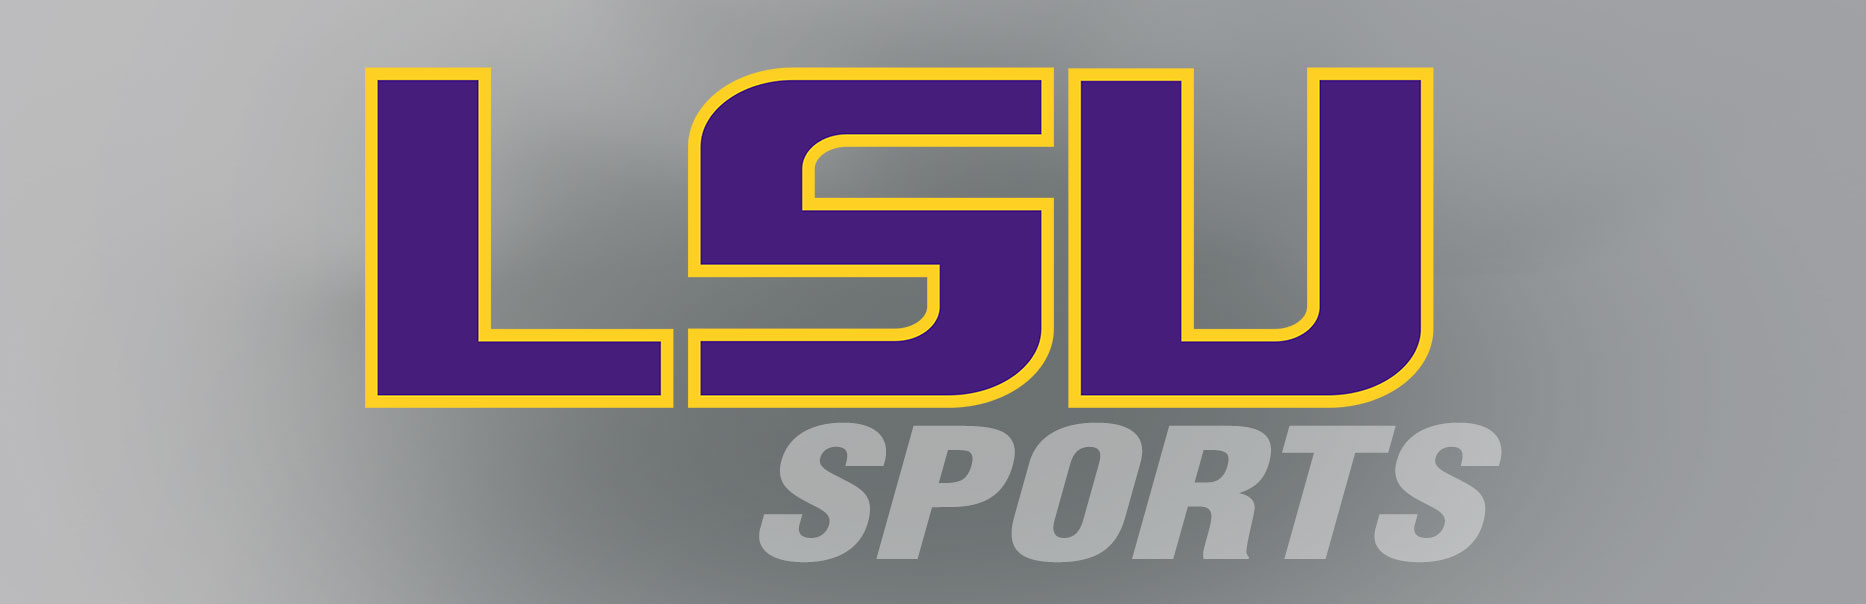 LSU_Sports